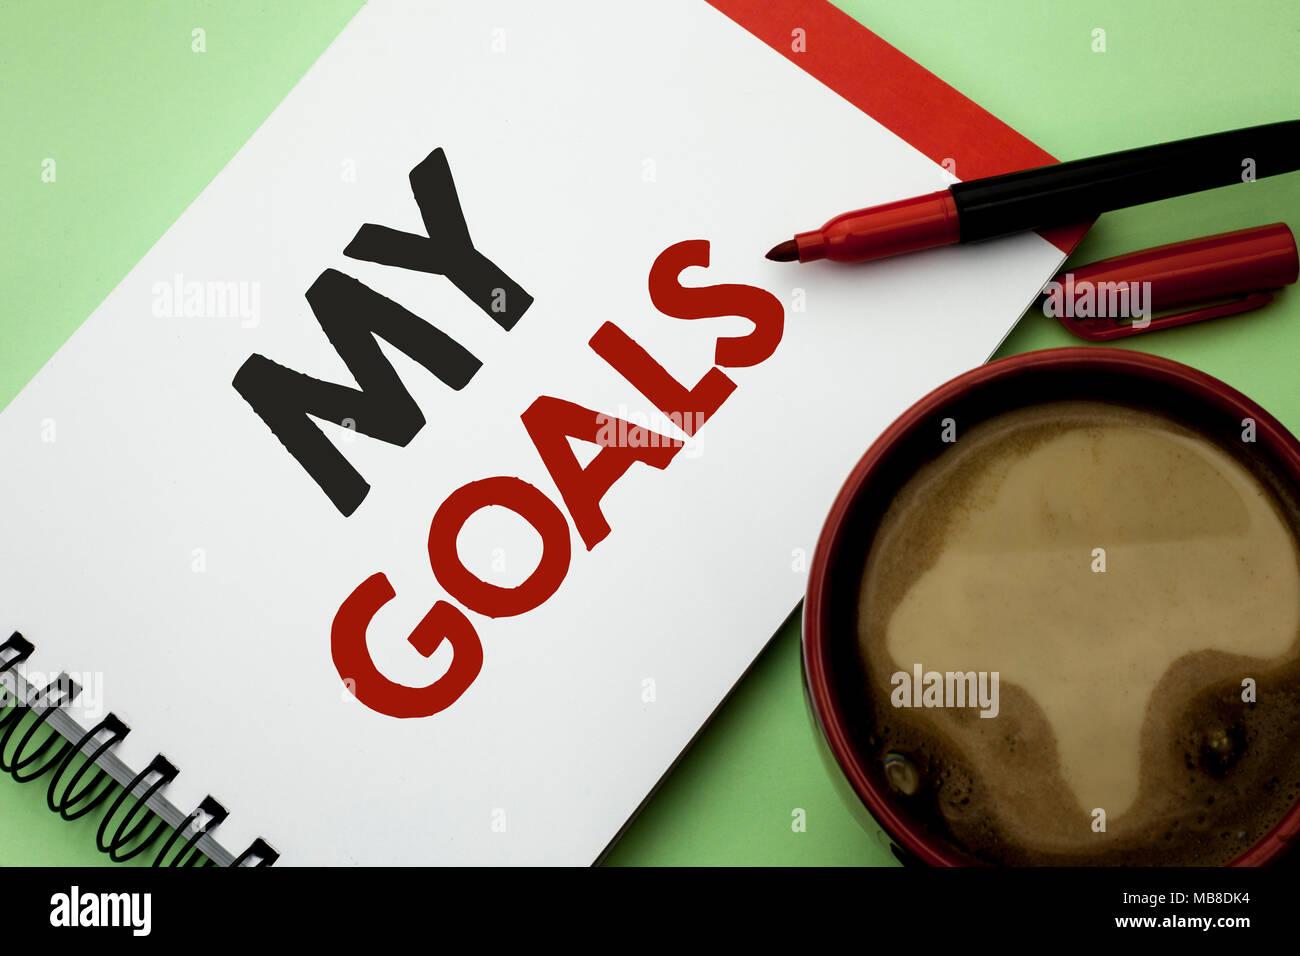 career goal meaning